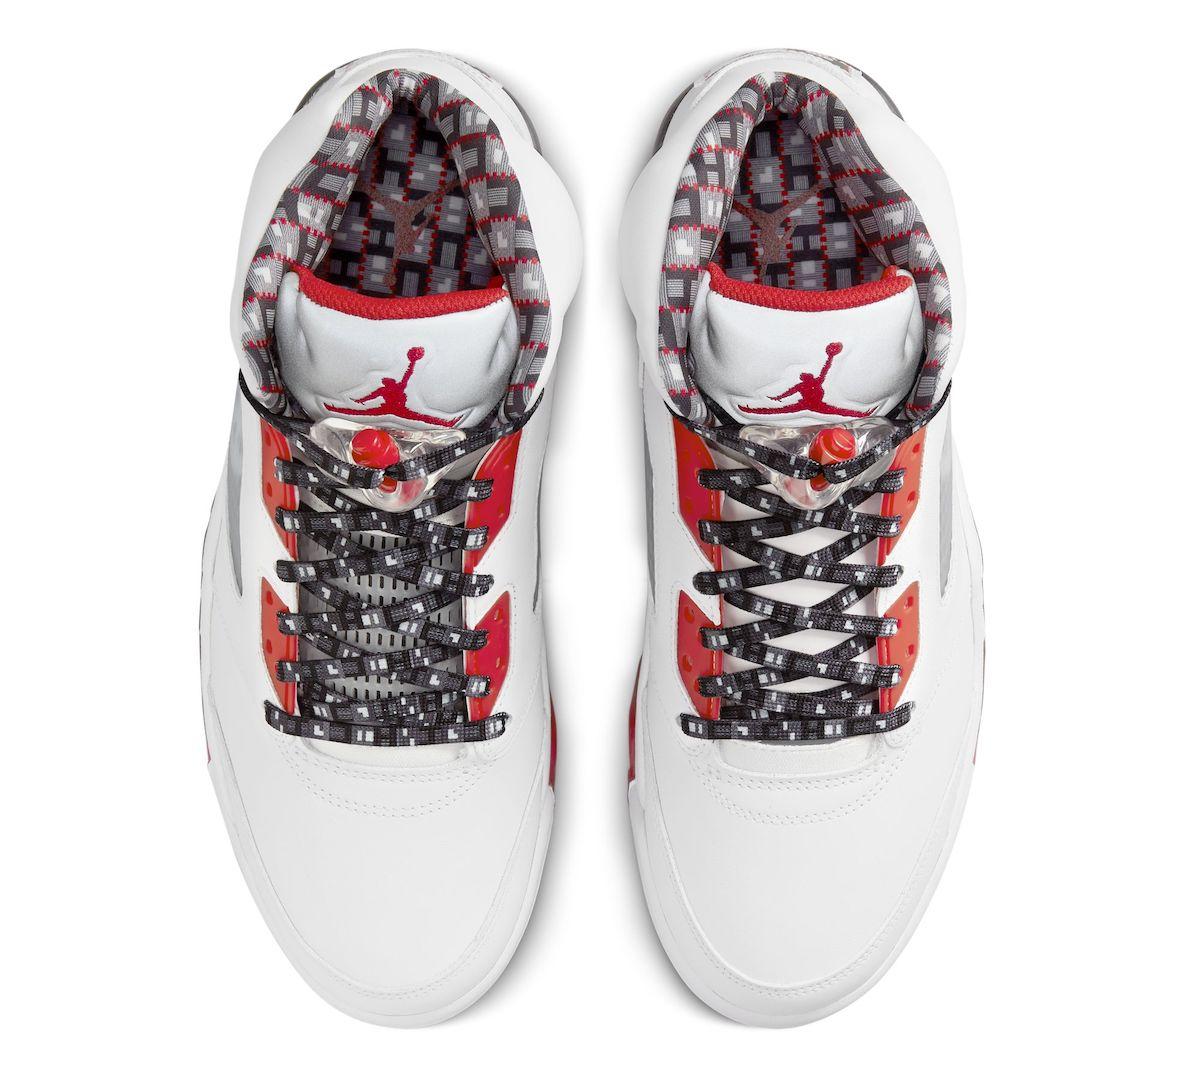 Air Jordan 5 Quai 54 2021 Release Date Info